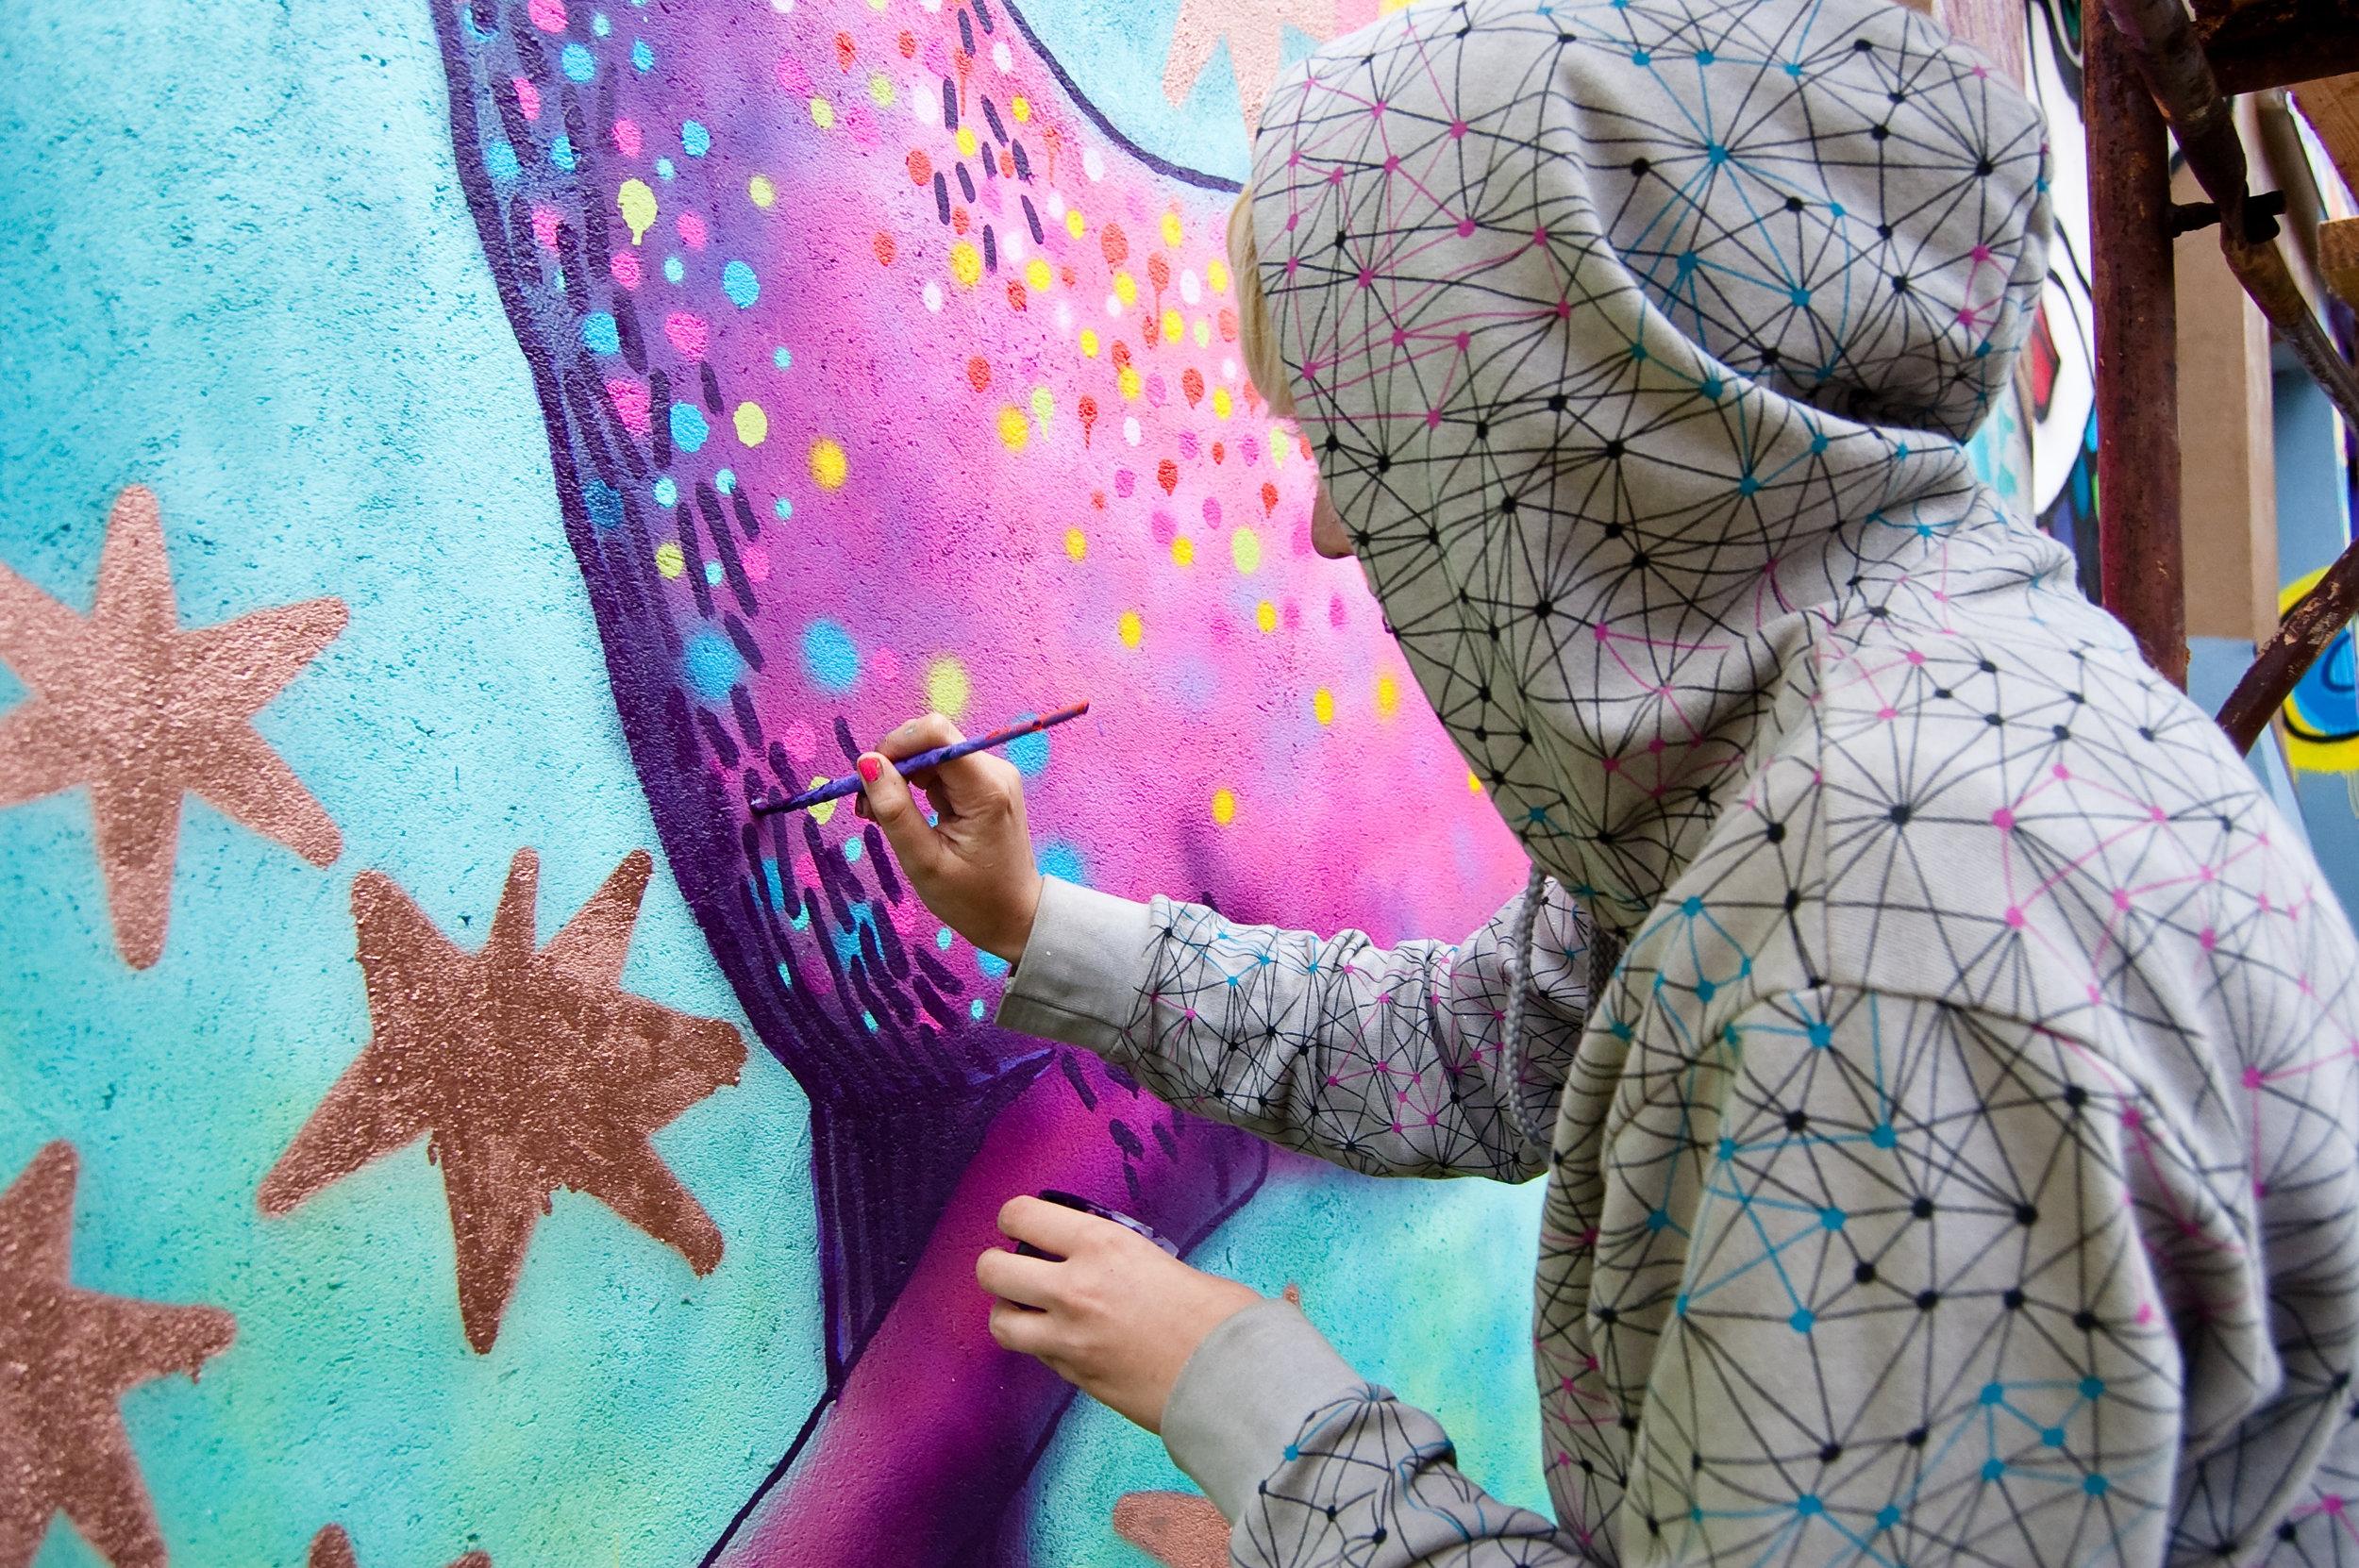 Creative Art Meditations - A Monthly Painting Retreat + Women's Creativity CircleReflect. Reconnect. Rejuvenate.